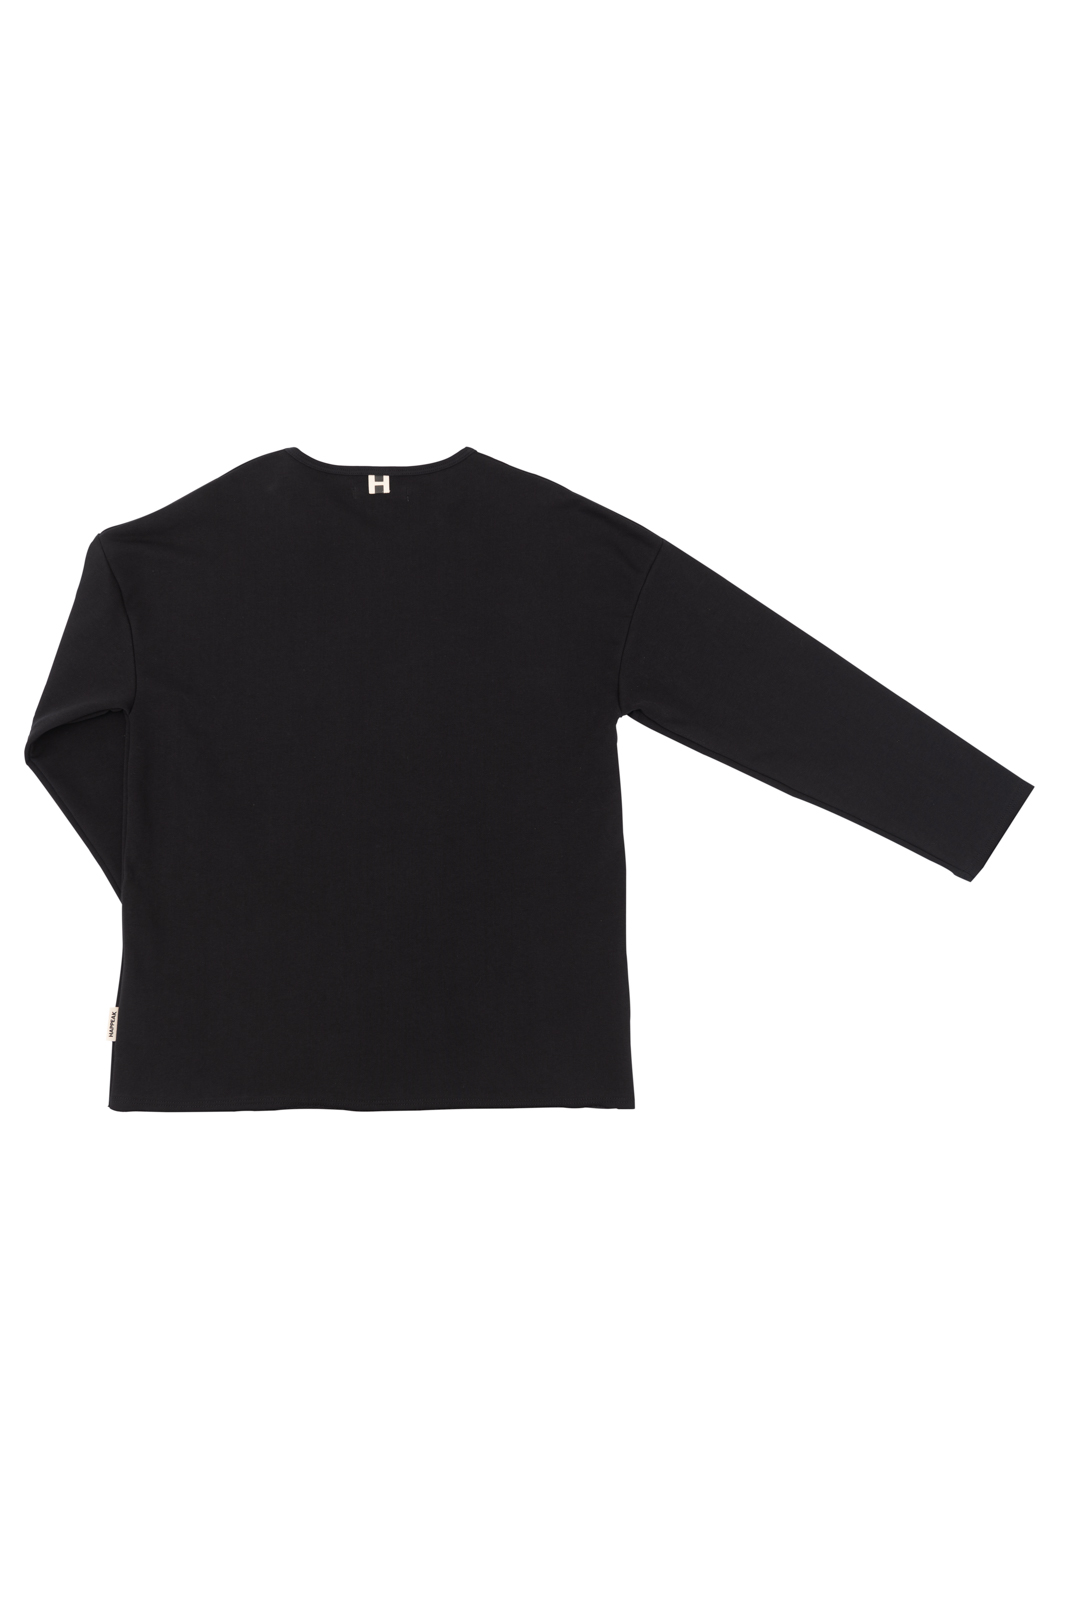 "Marškinėliai ""Baui"" FINAL SALE  - 5"